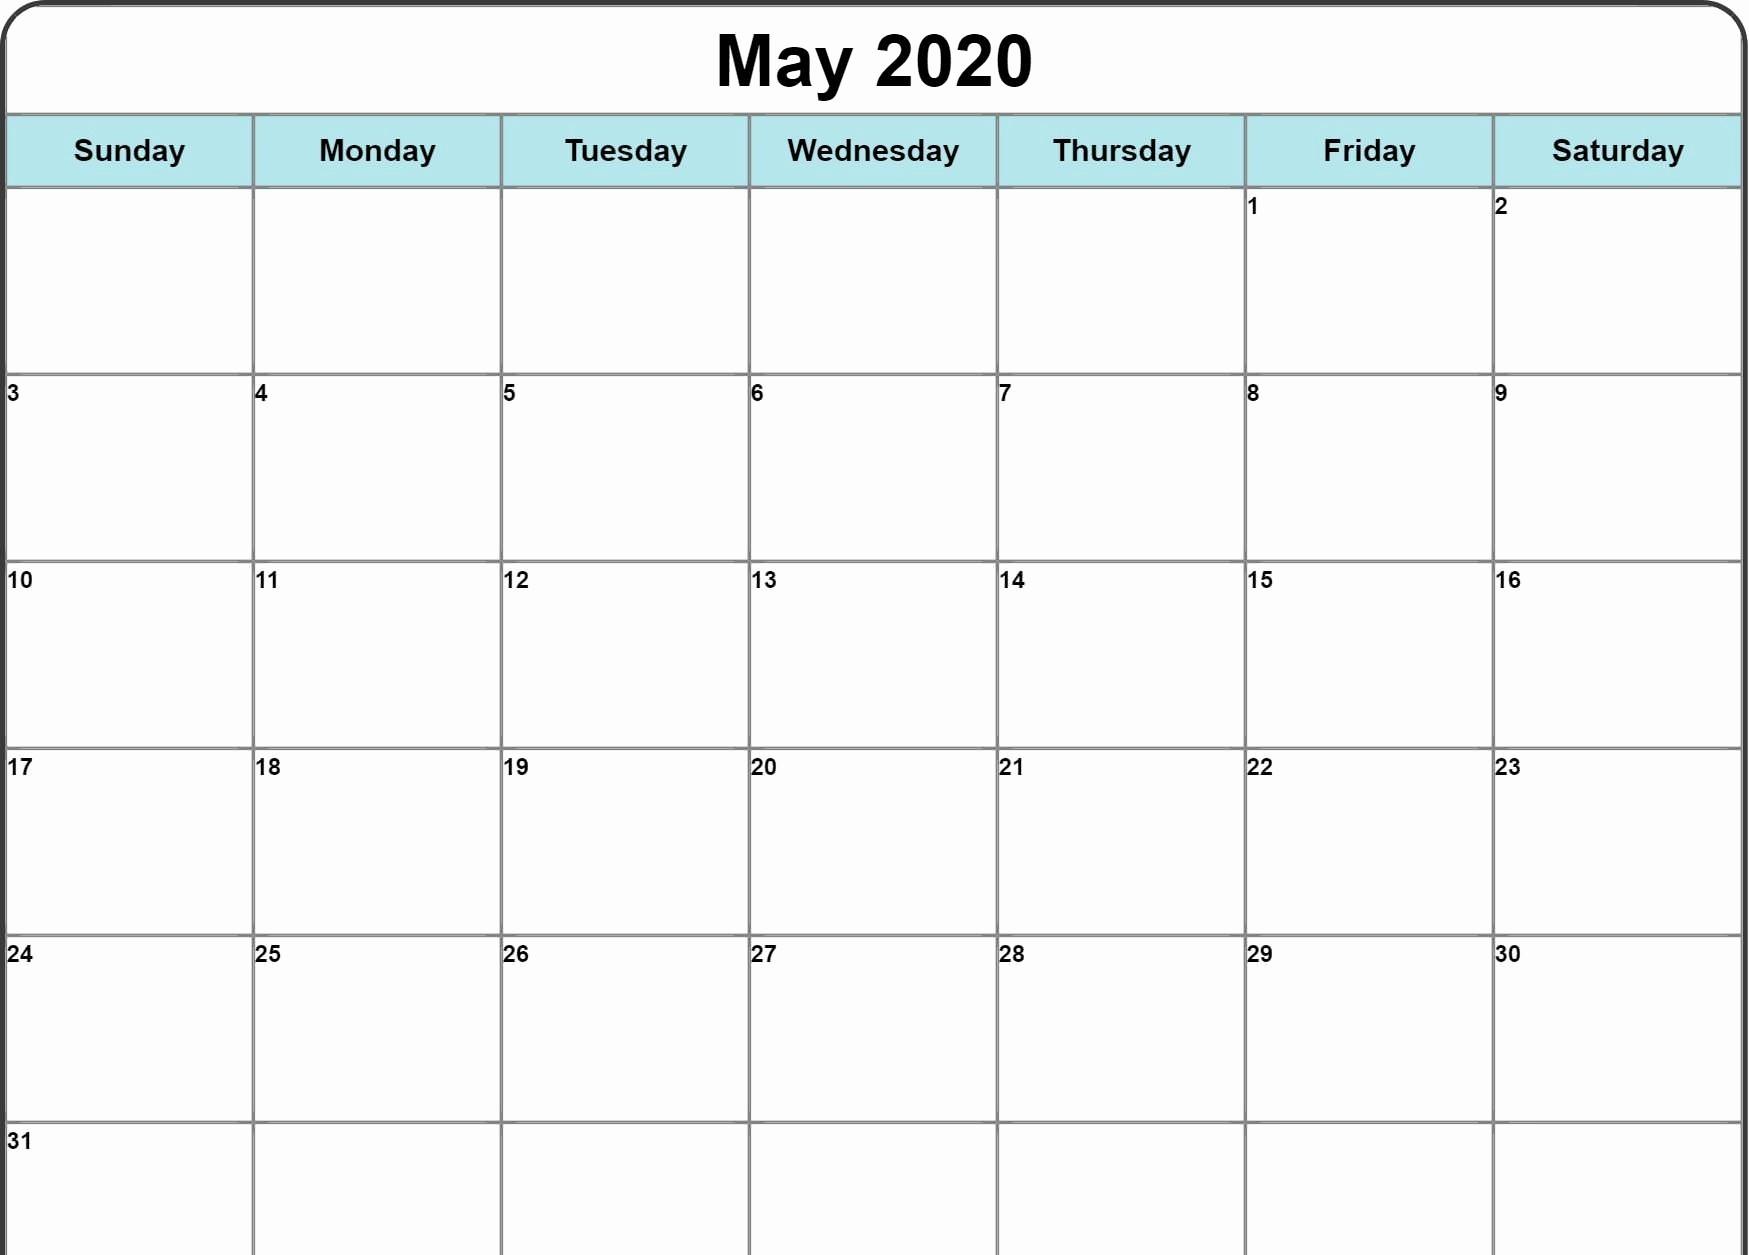 Free Blank May Calendar 2020 Printable Template-Printable Monthly Bill Pay Calendar 2020